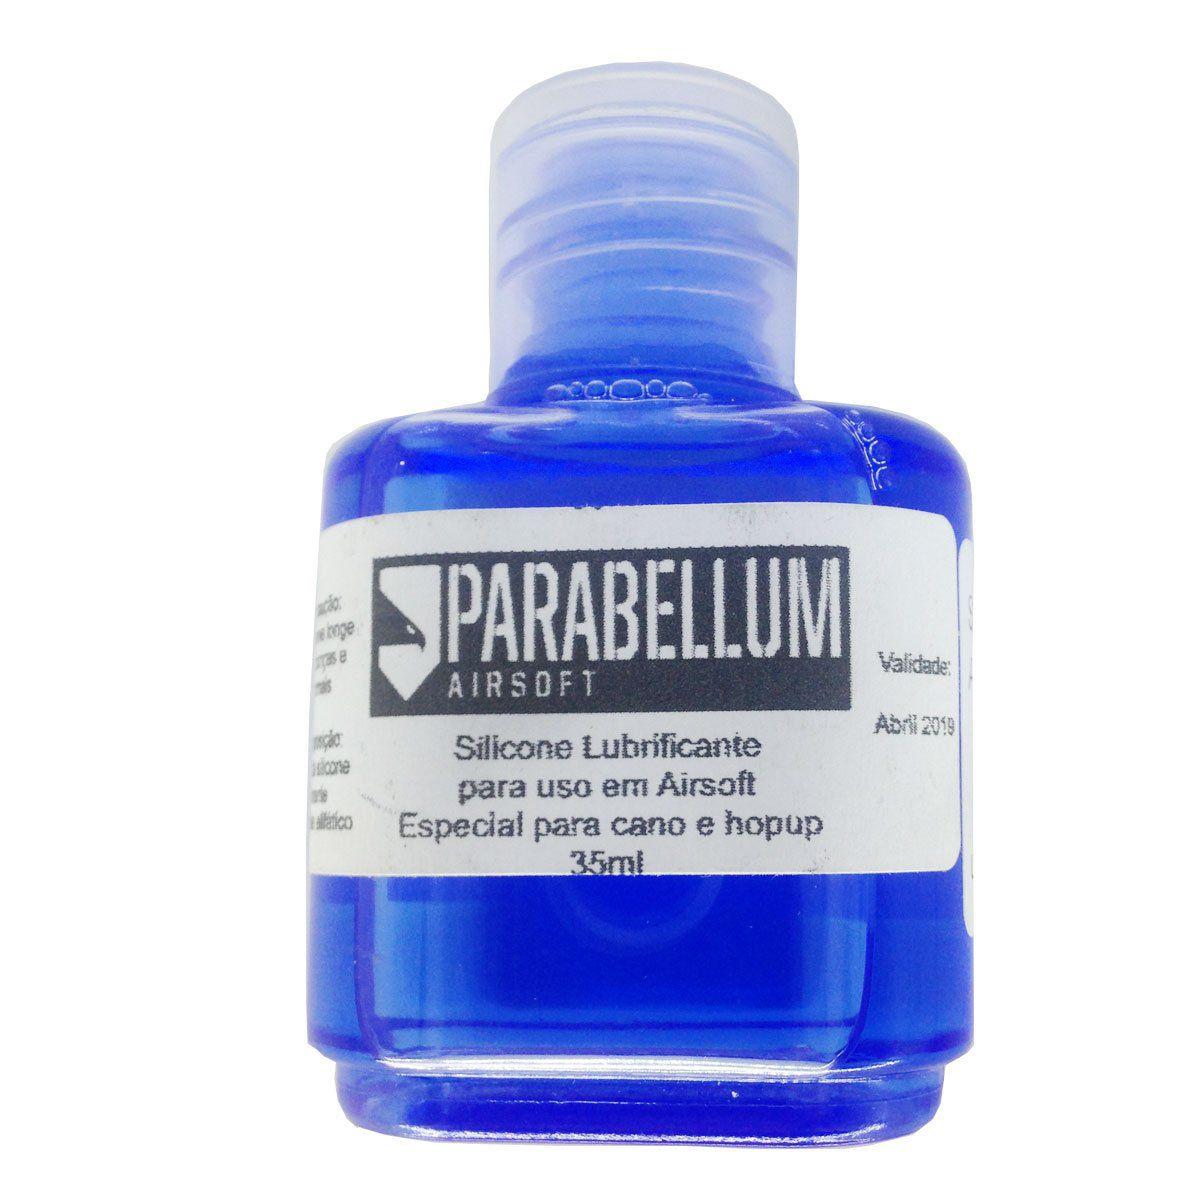 Silicone Lubrificante Para Airsoft 35ml Parabellum